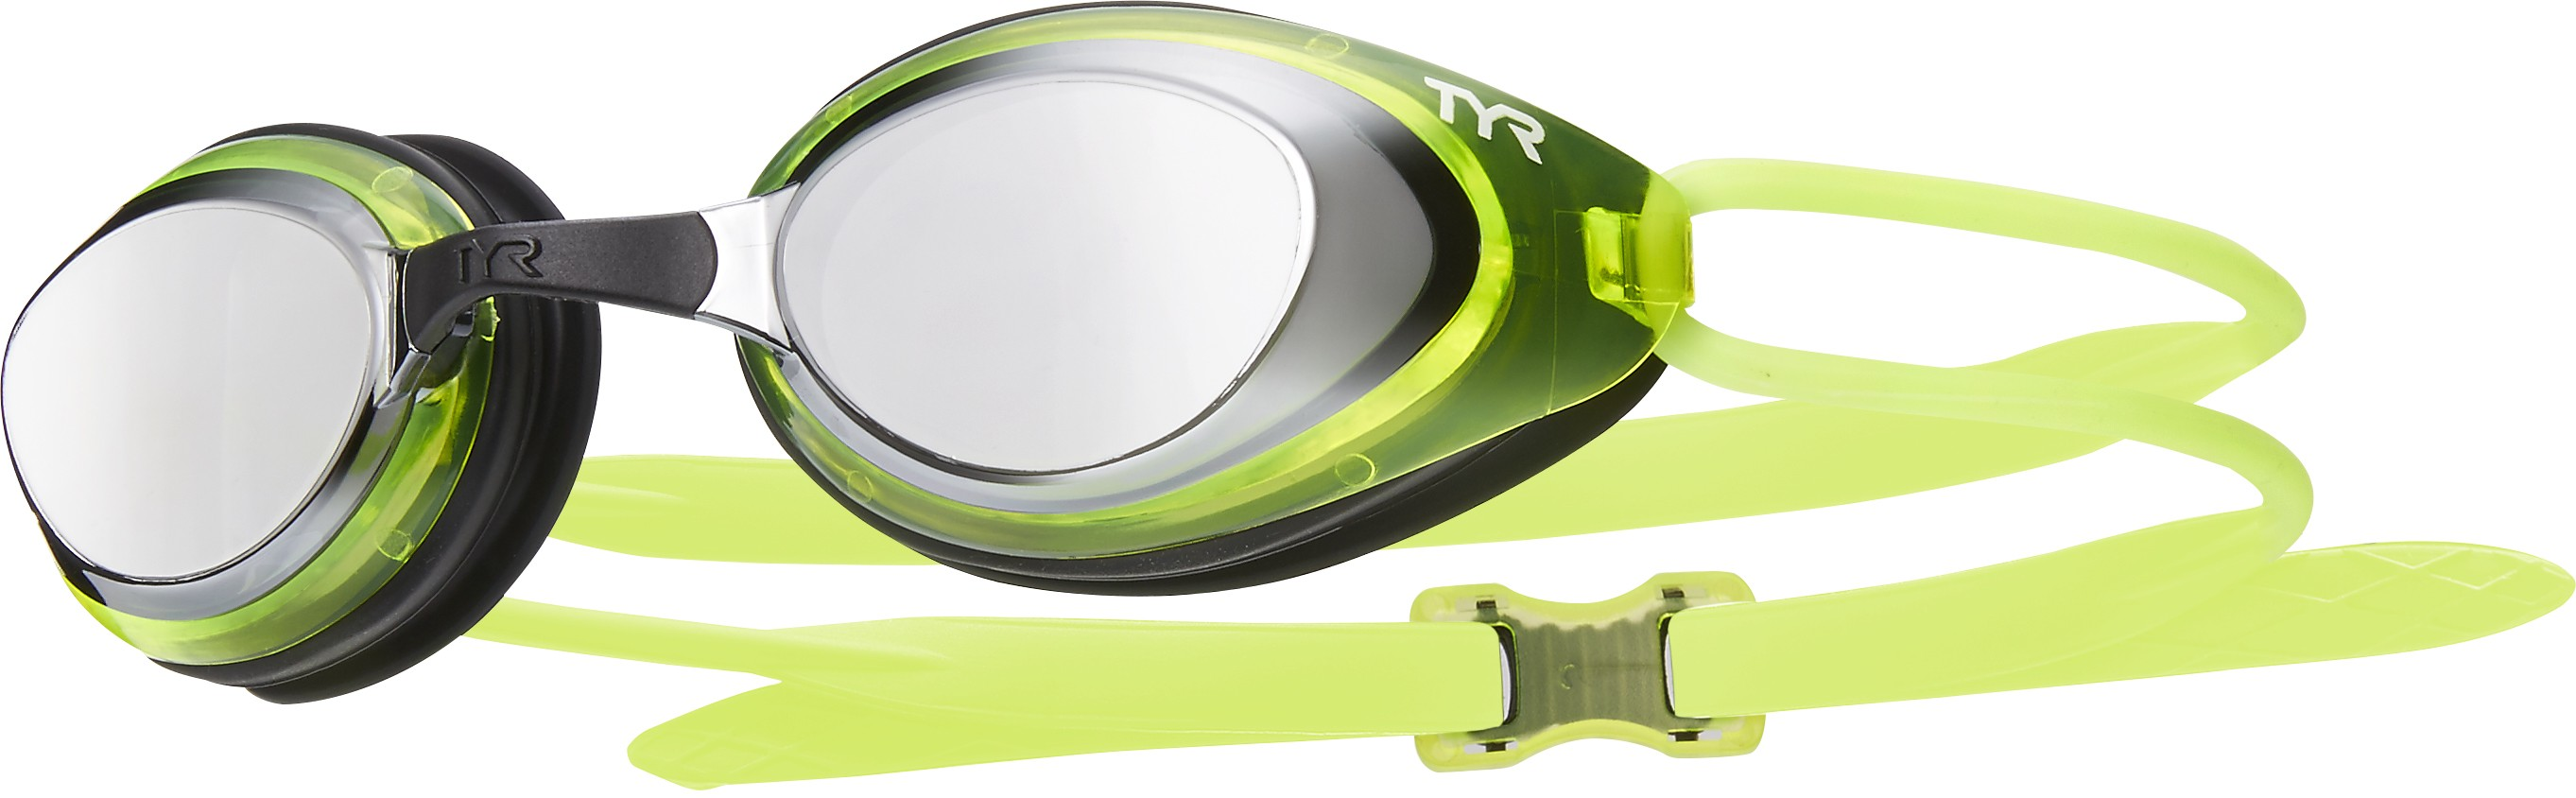 a38310bbbcd TYR Blackhawk Racing Polarized Swim Goggles ...